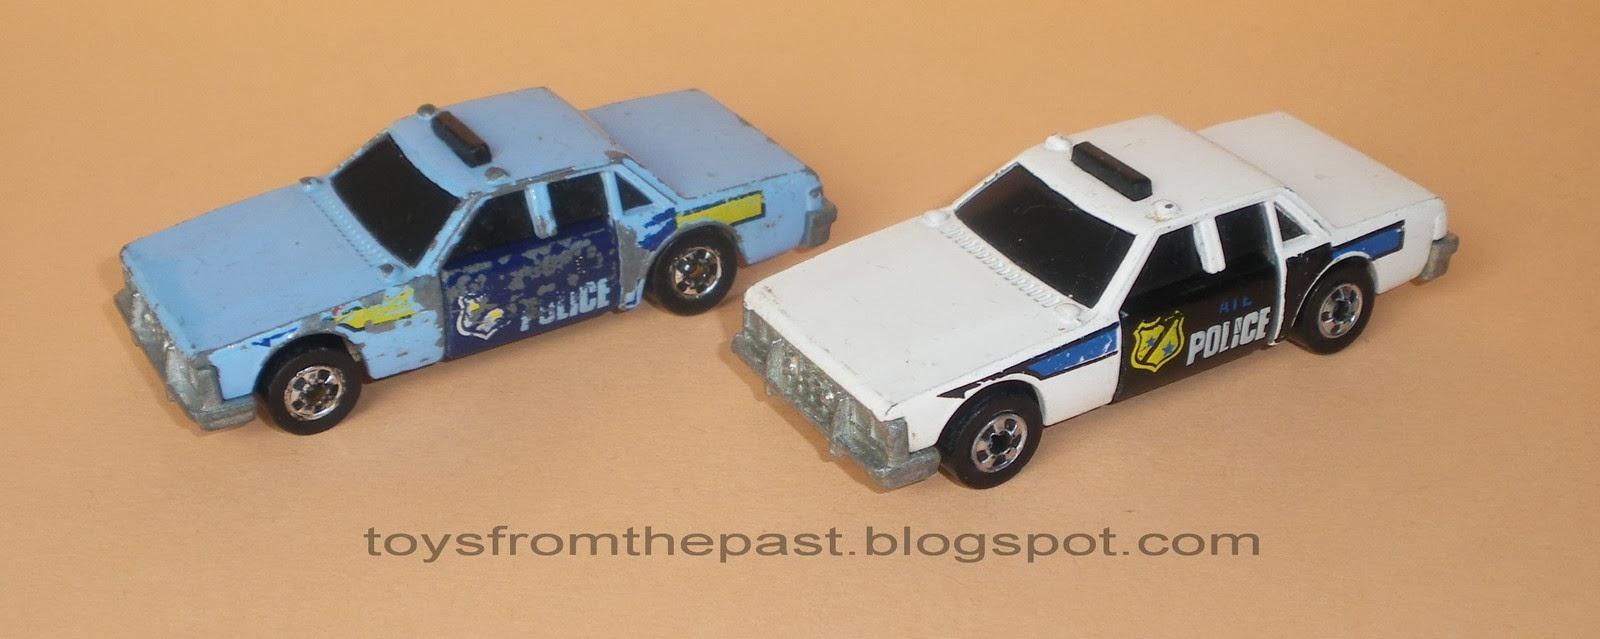 Crash Of Cars Hidden Car Mine